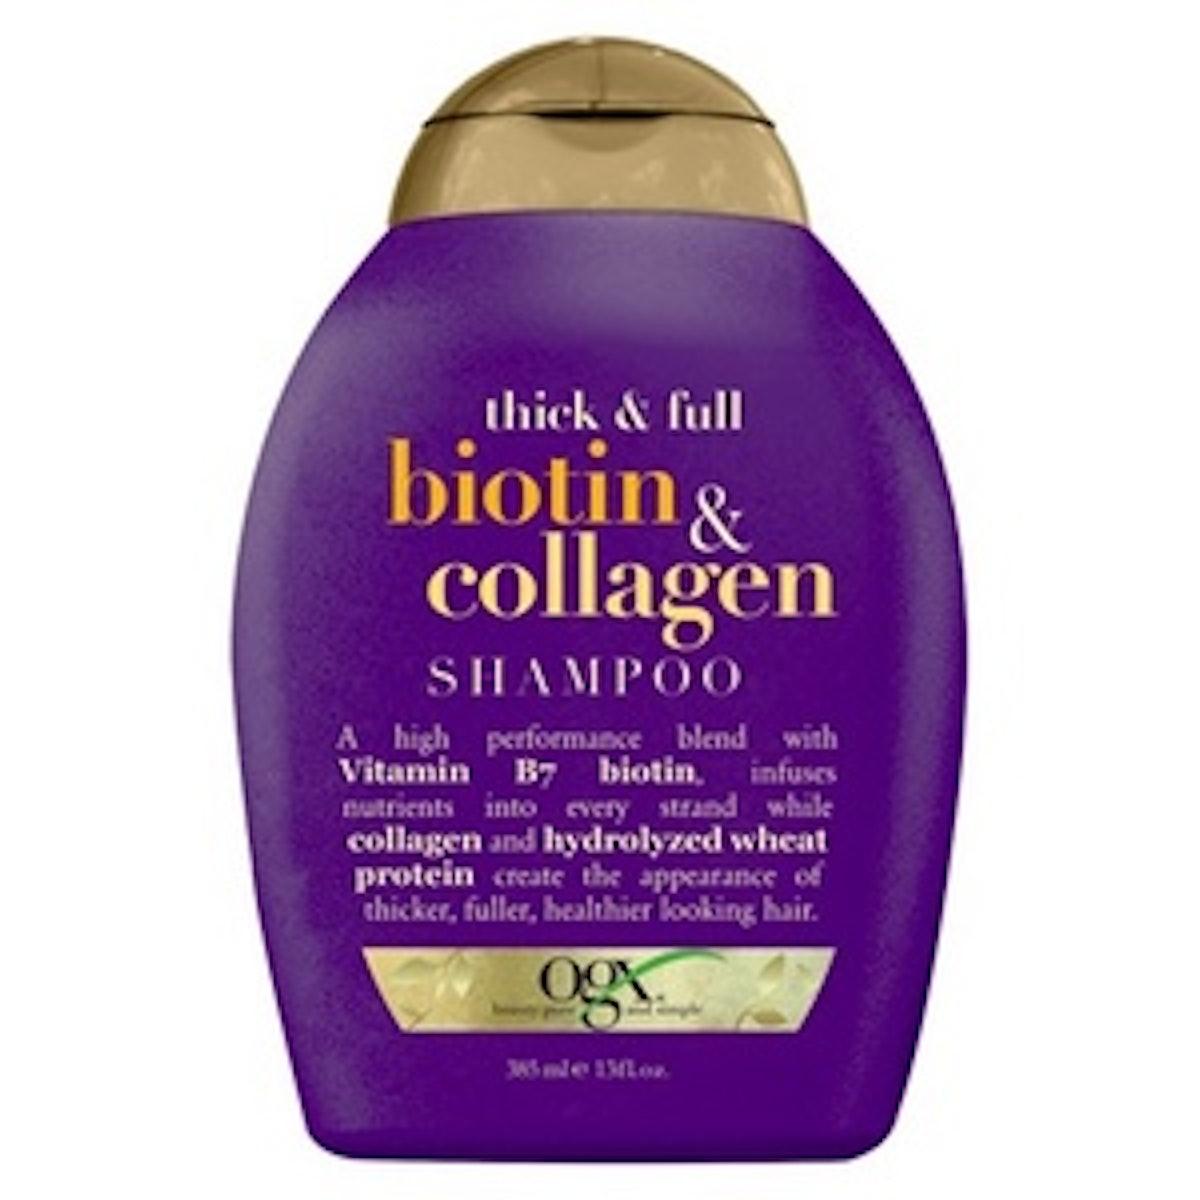 Biotin and Collagen Shampoo